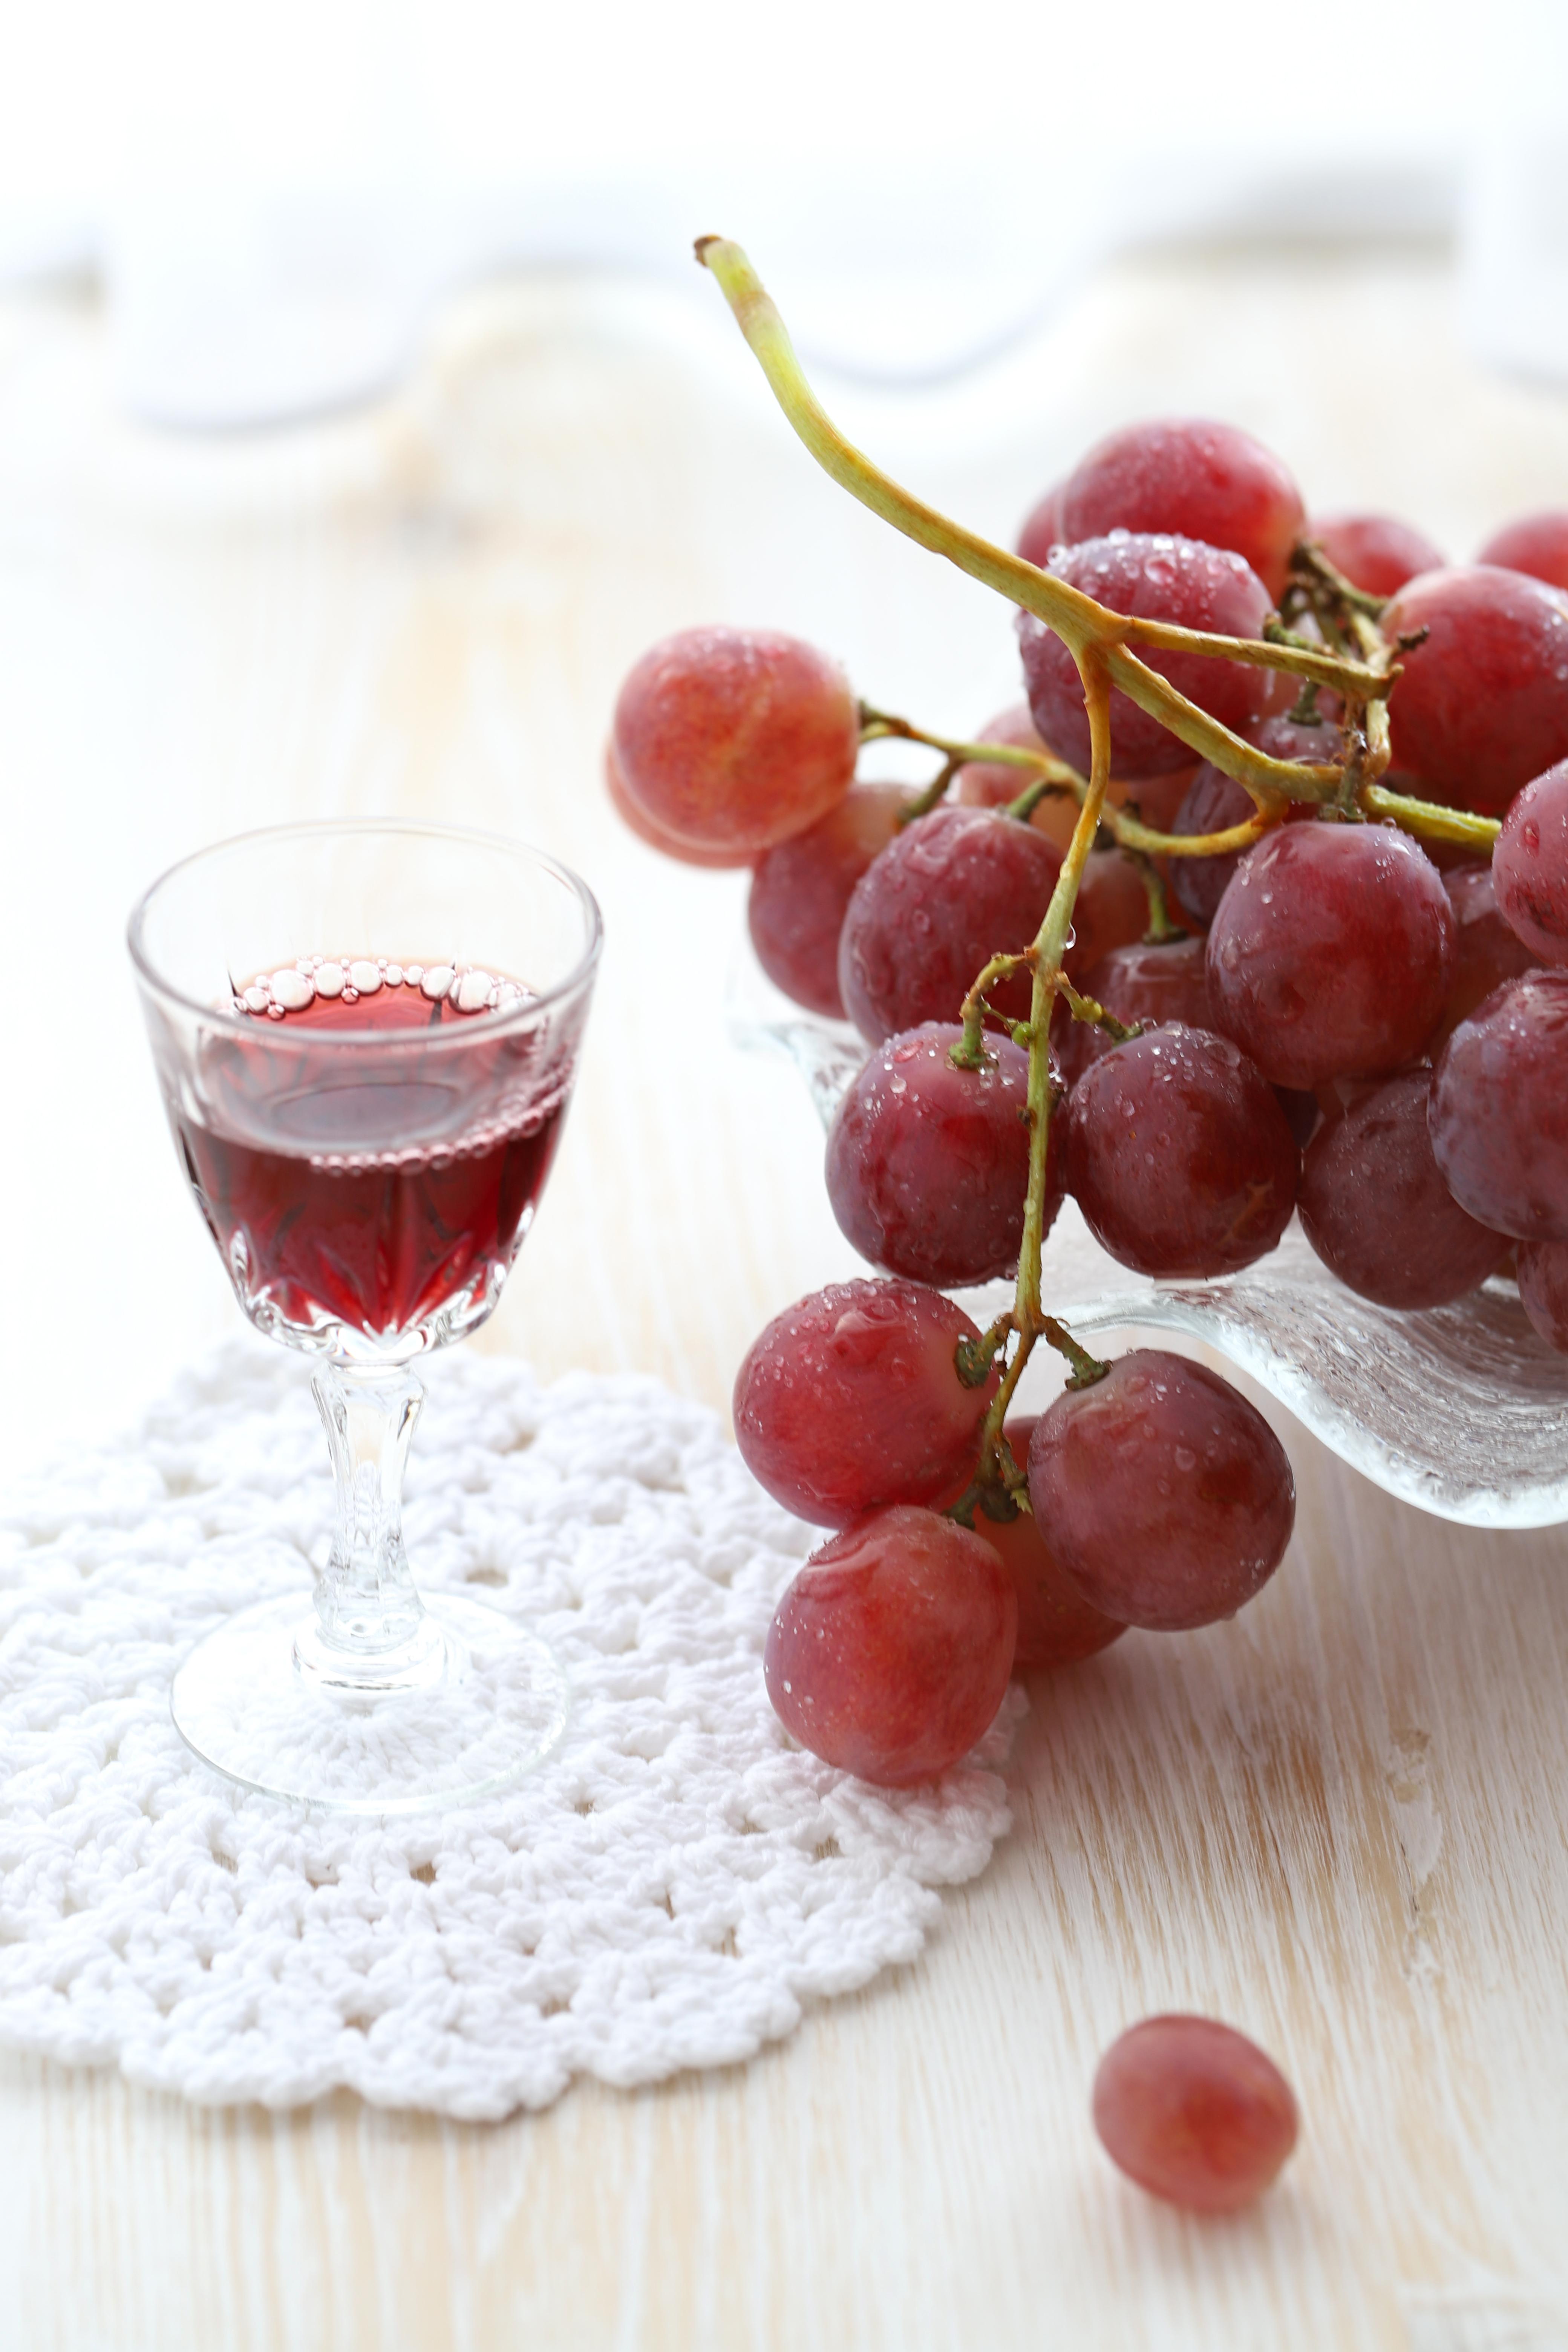 Raisin et vin - wine and grappes - delimoon.com